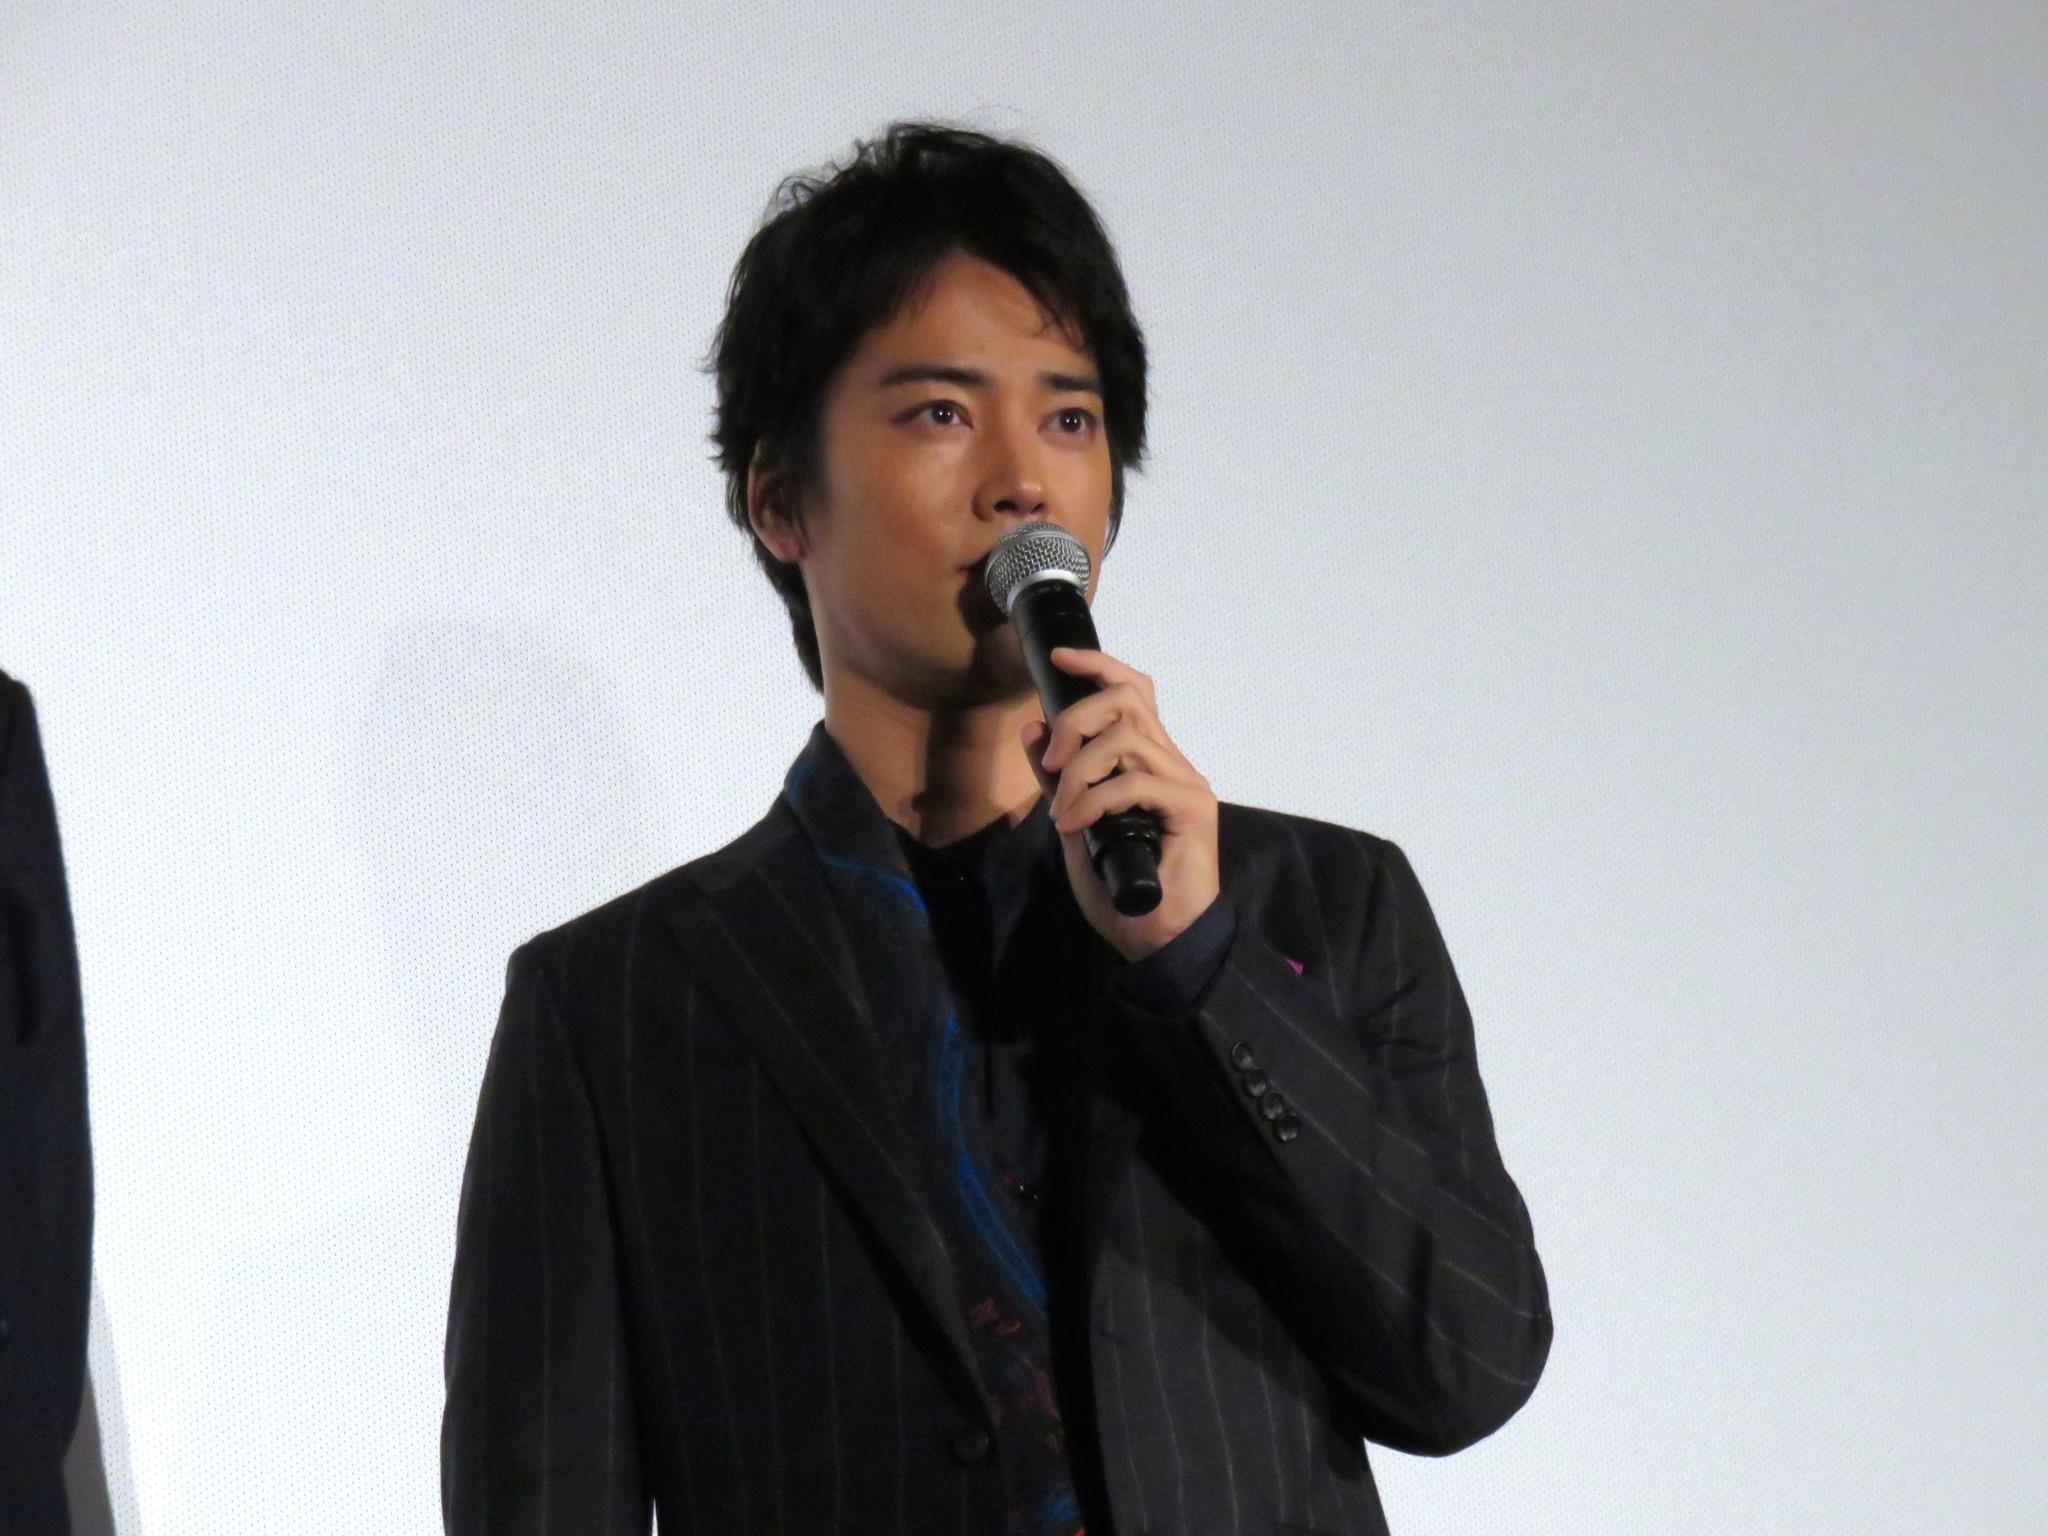 http://news.yoshimoto.co.jp/20171201003444-af879a0b318fec7d7c2a2680503faa33b167048e.jpg